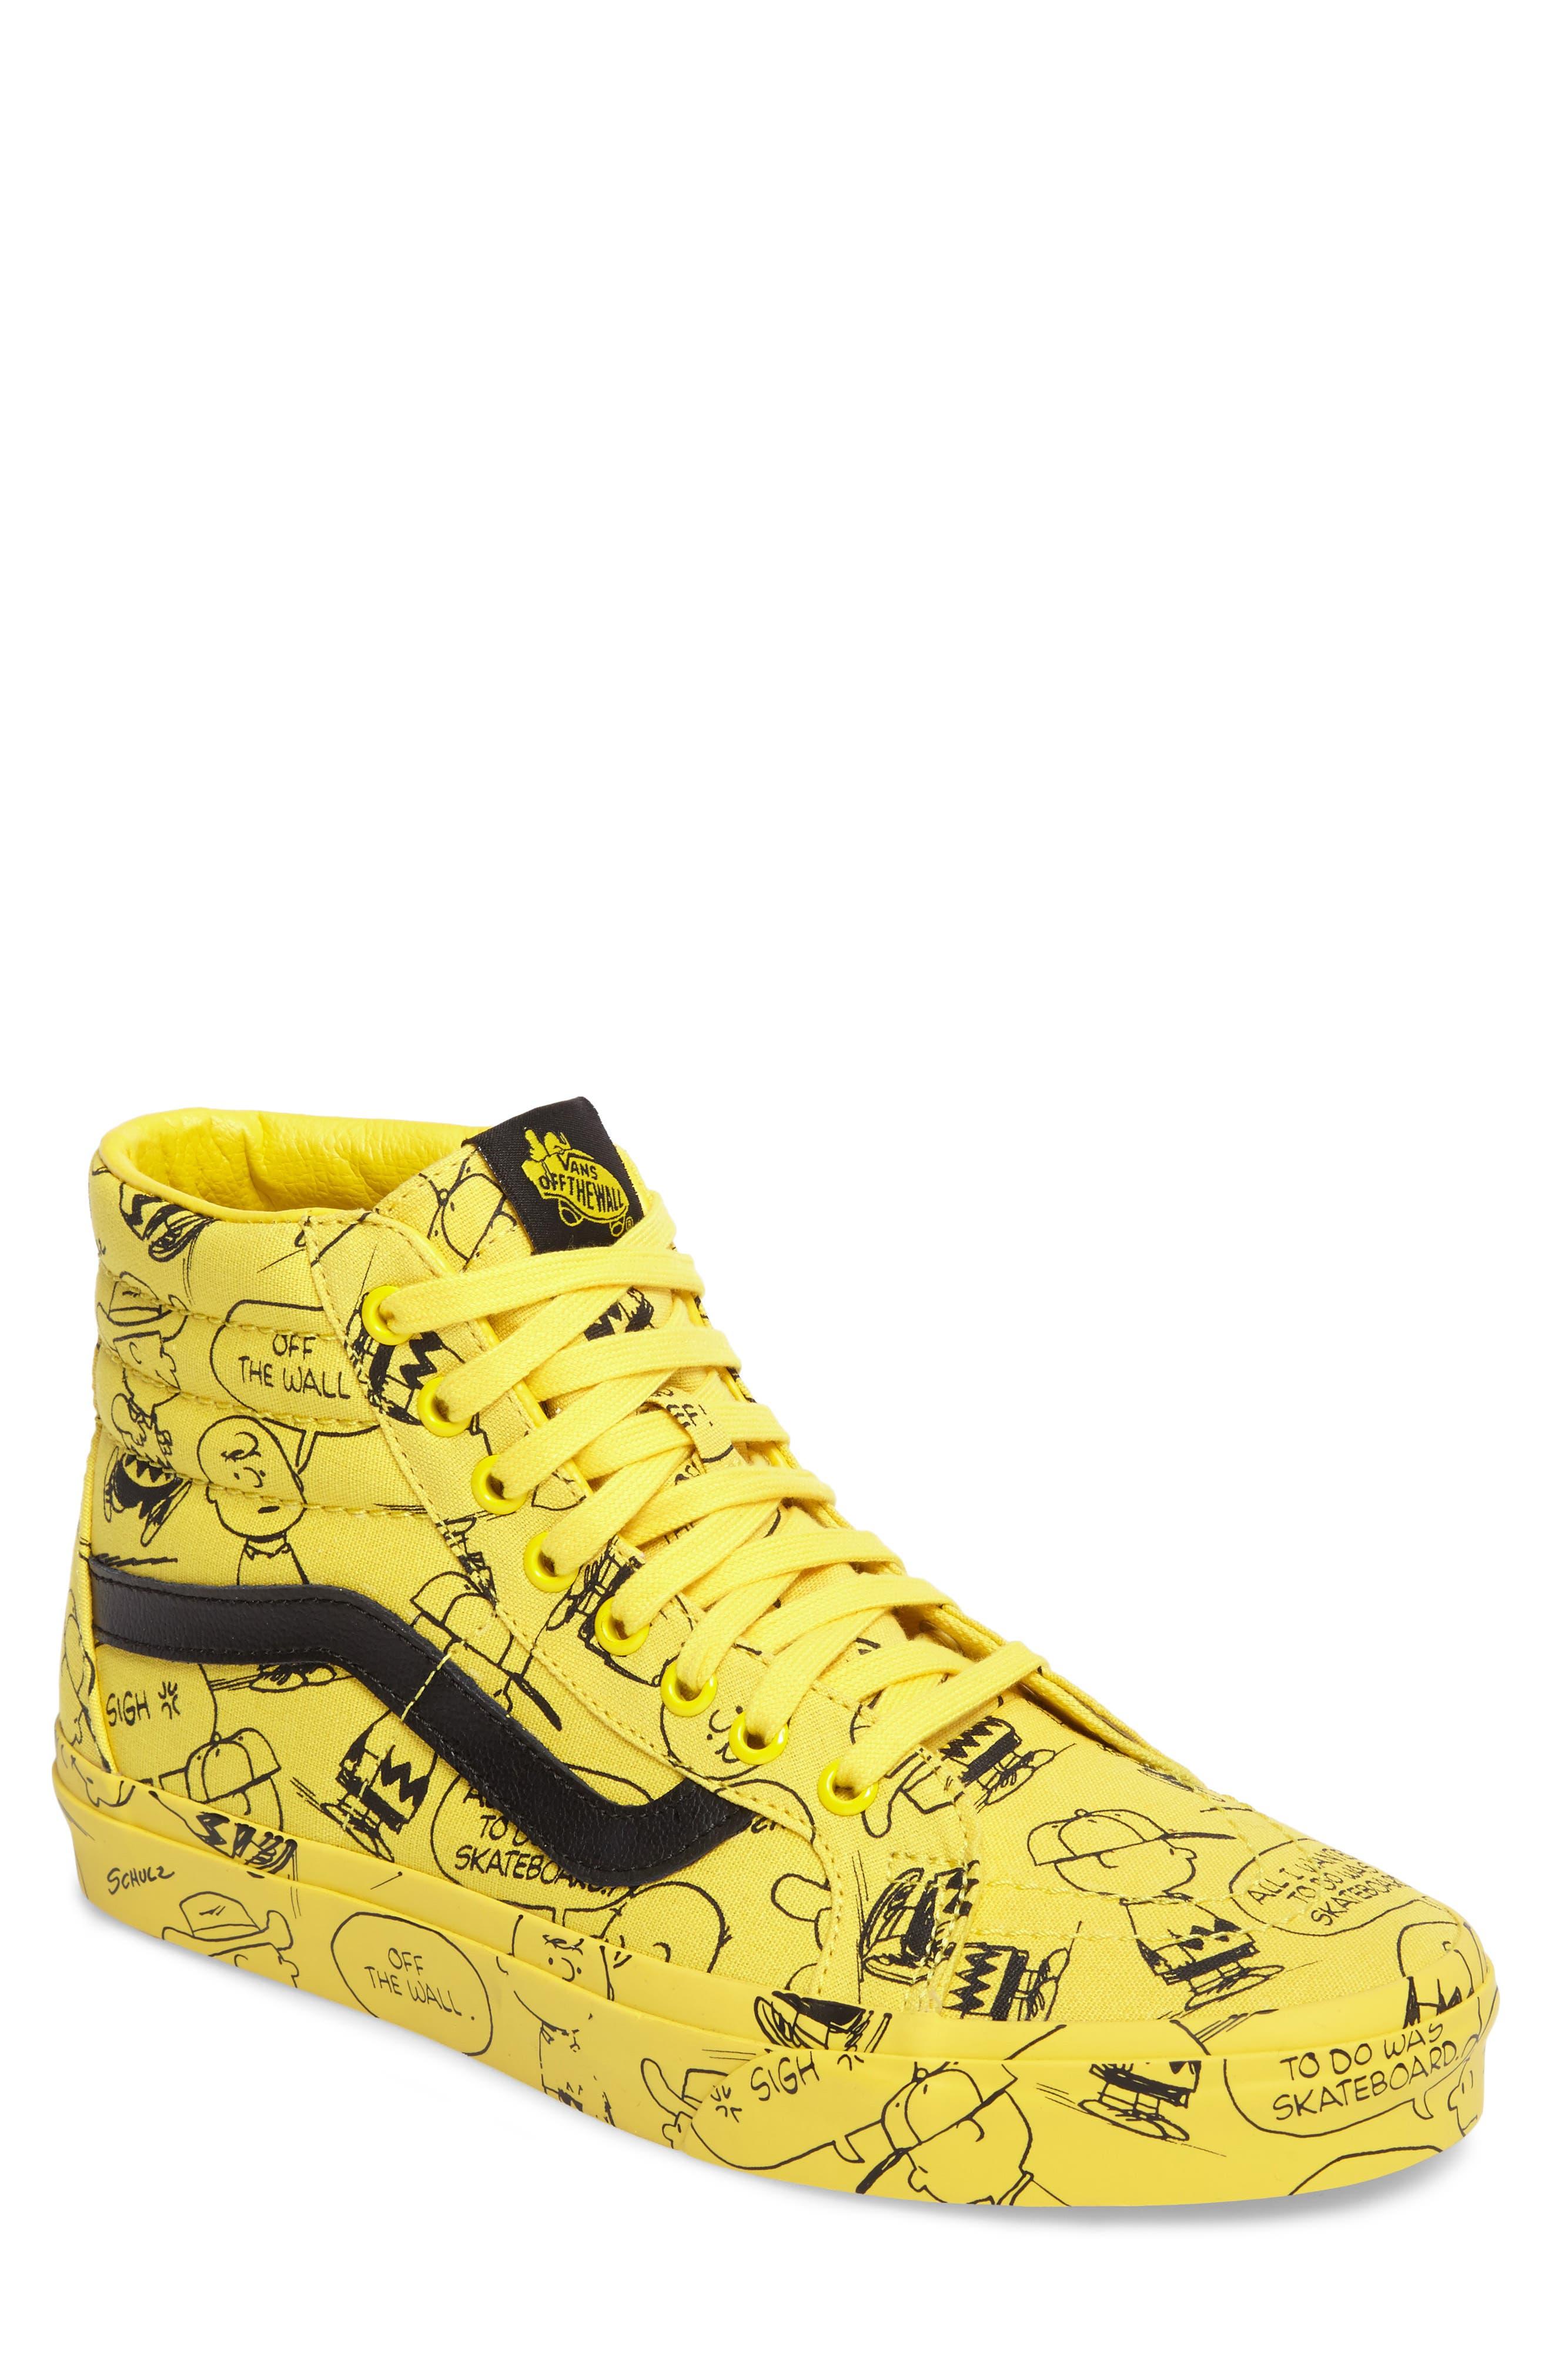 x Peanuts<sup>®</sup> Sk8-Hi Reissue Sneaker,                             Main thumbnail 1, color,                             760